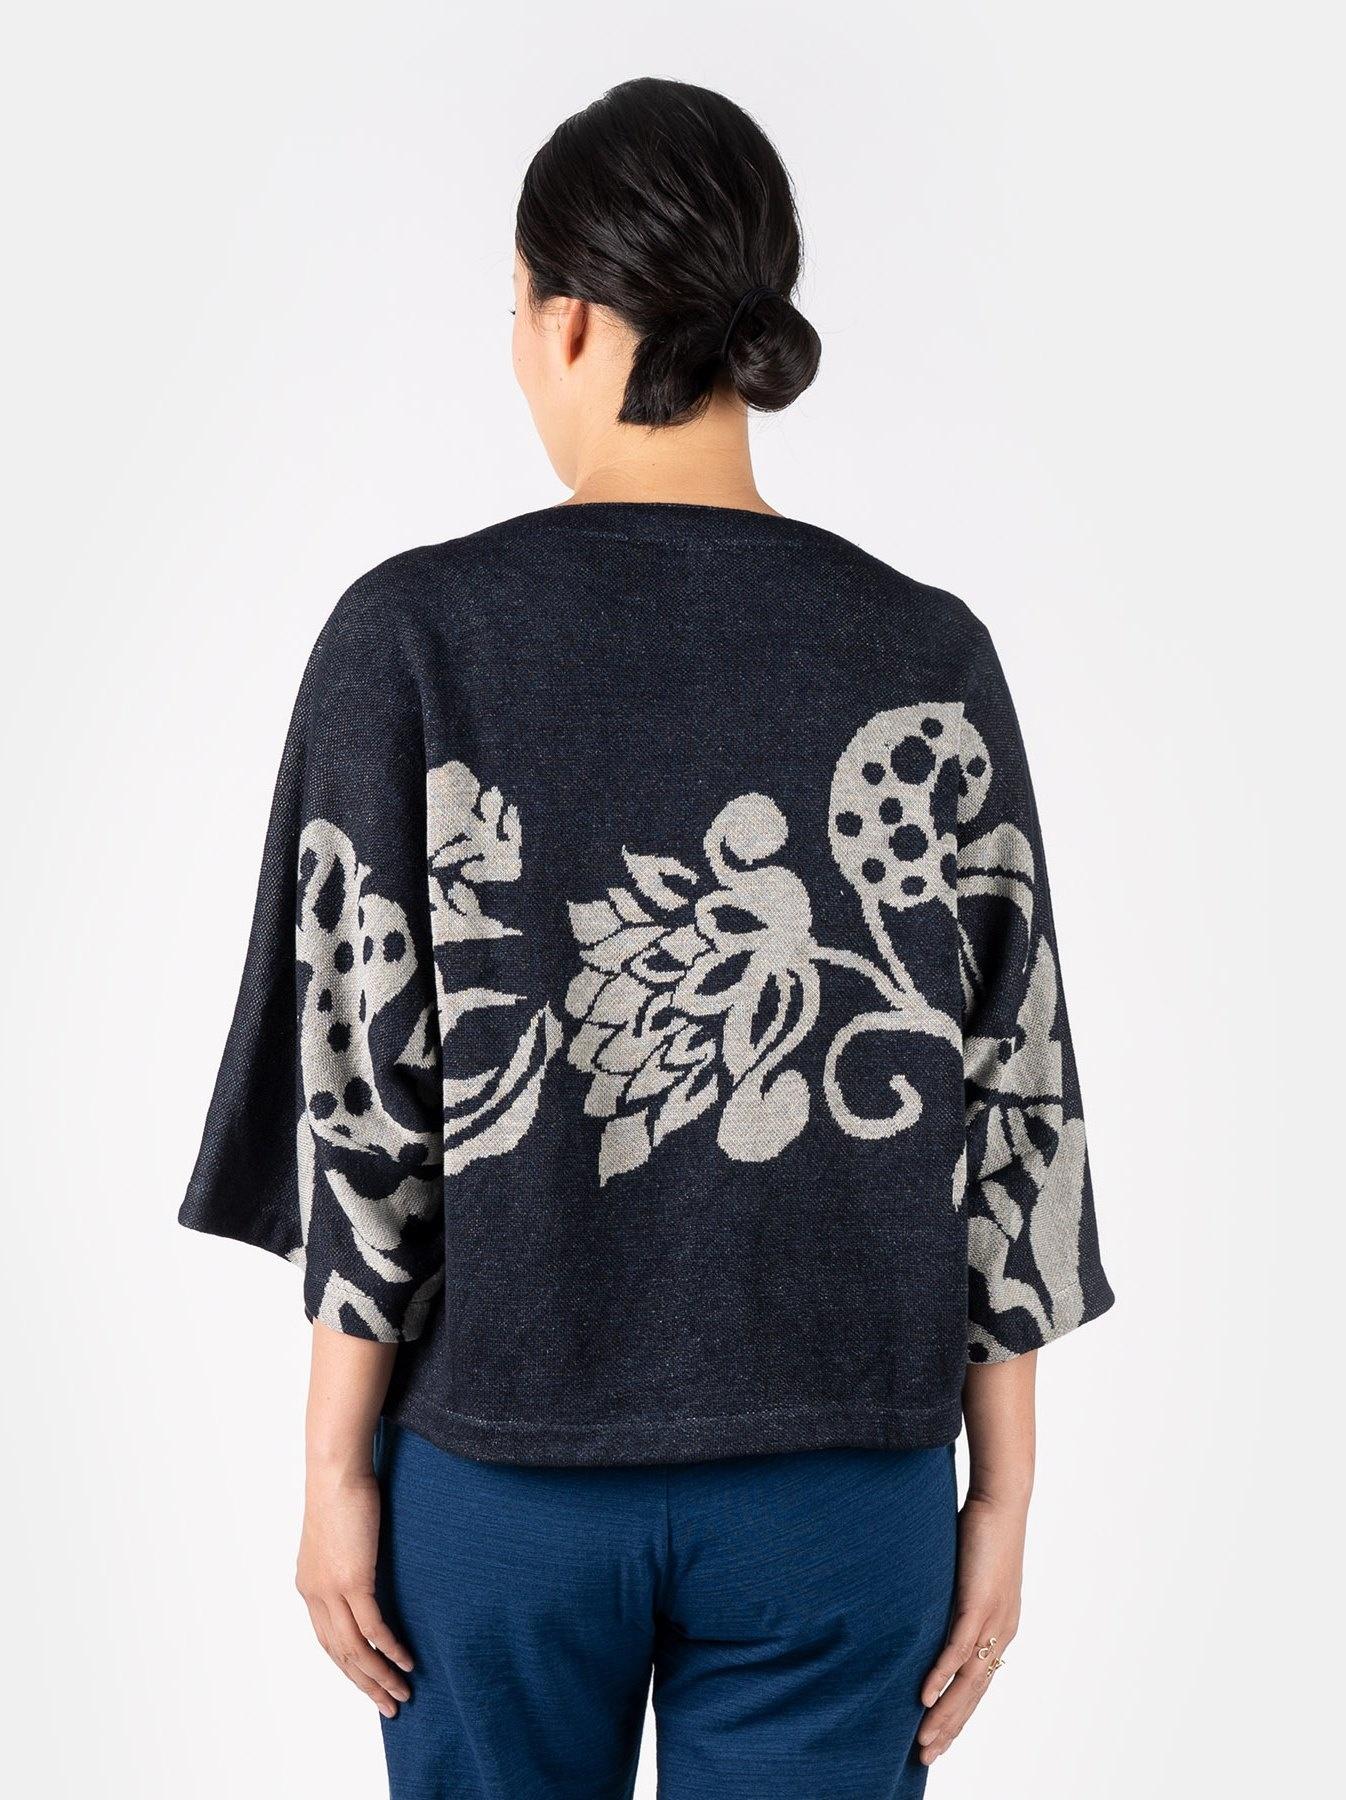 WH Indigo Linen Jacquard Yakko T-shirt-5